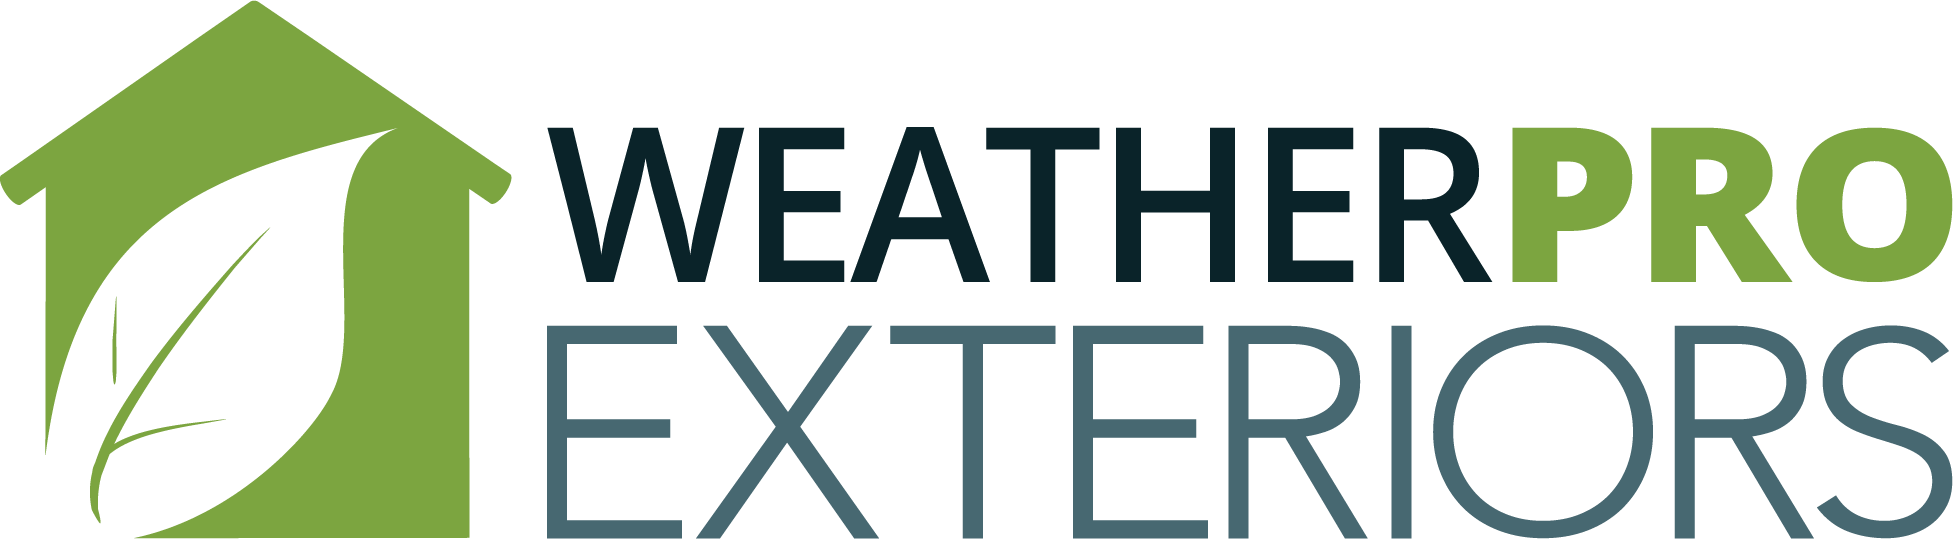 Weather Pro Exteriors